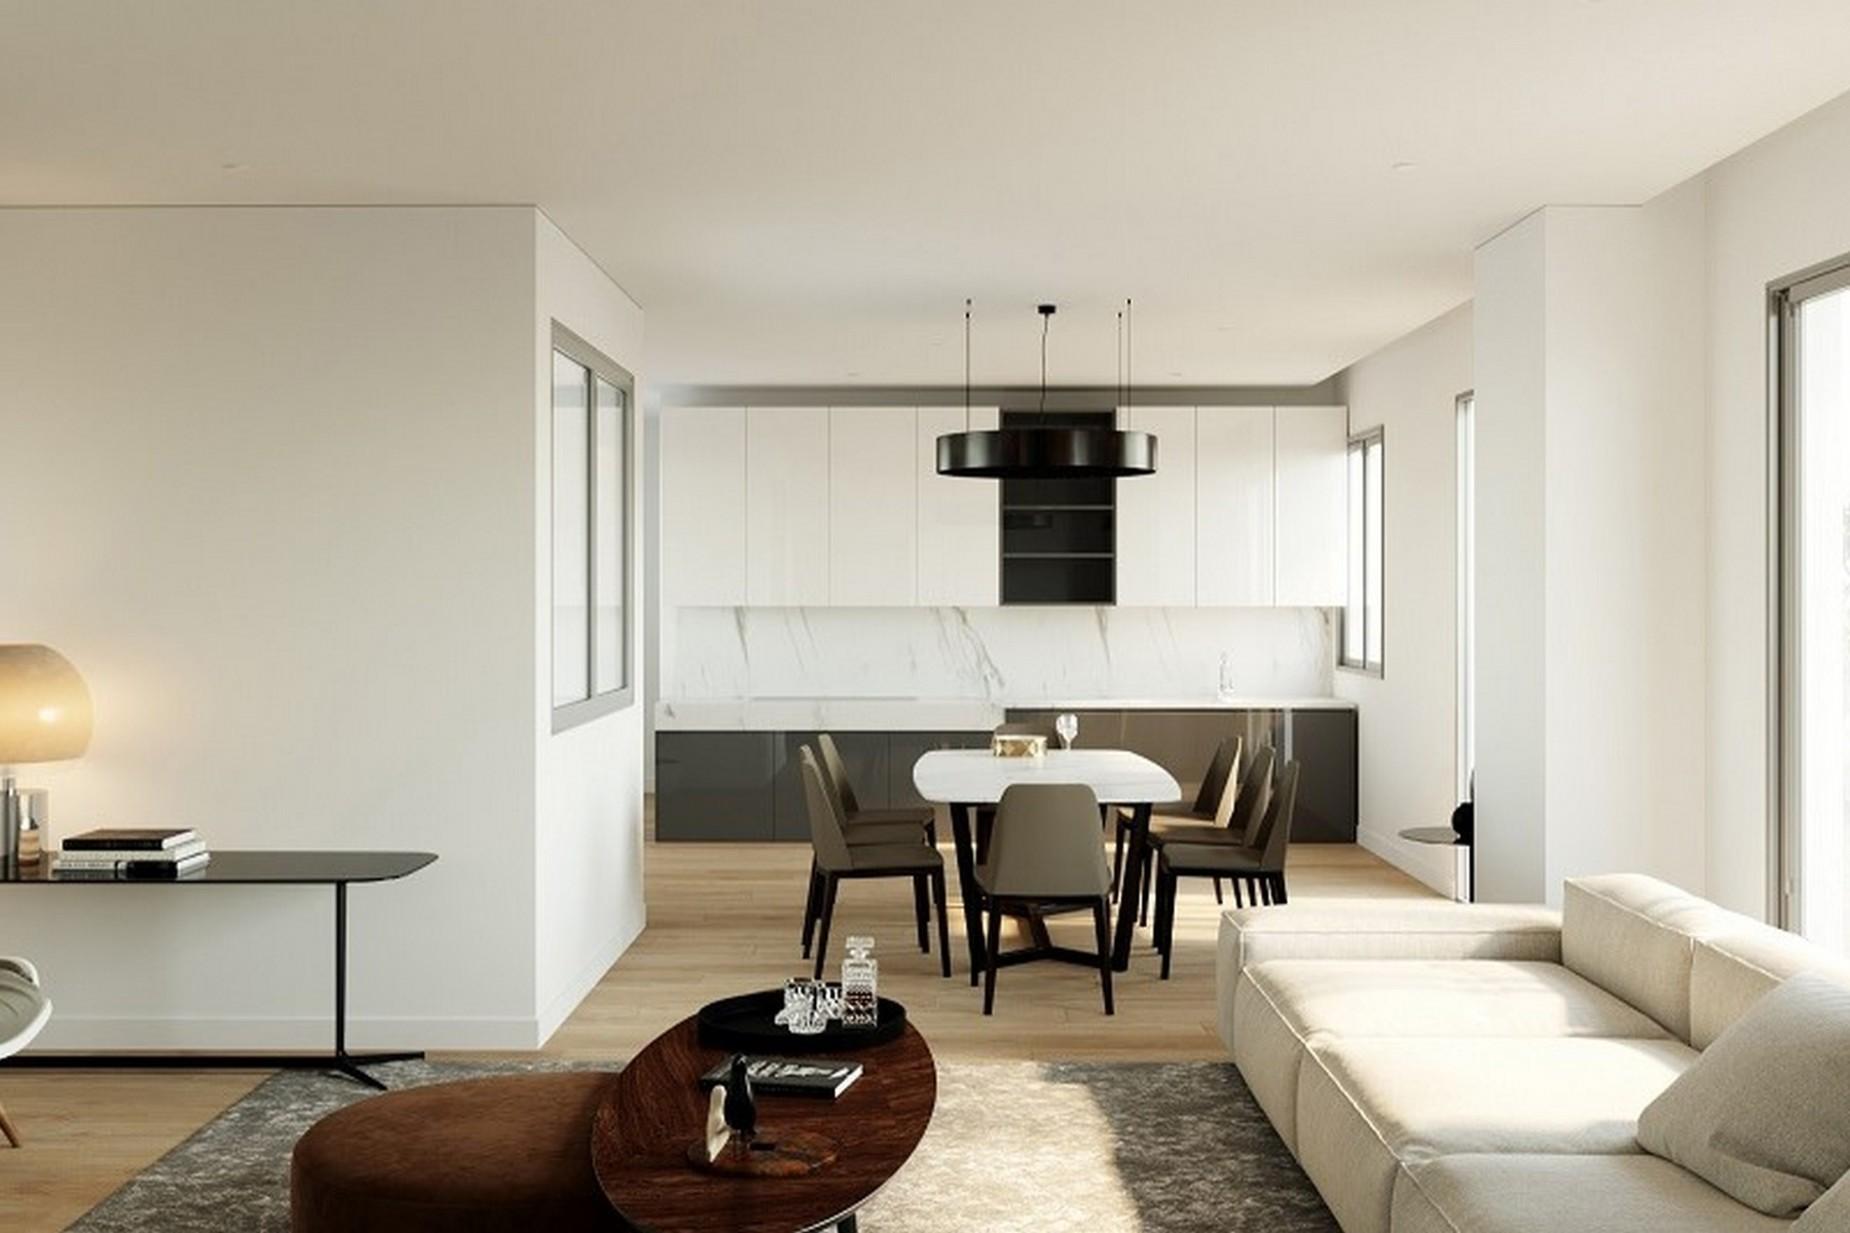 2 bed Apartment For Sale in Marsascala, Marsascala - thumb 2